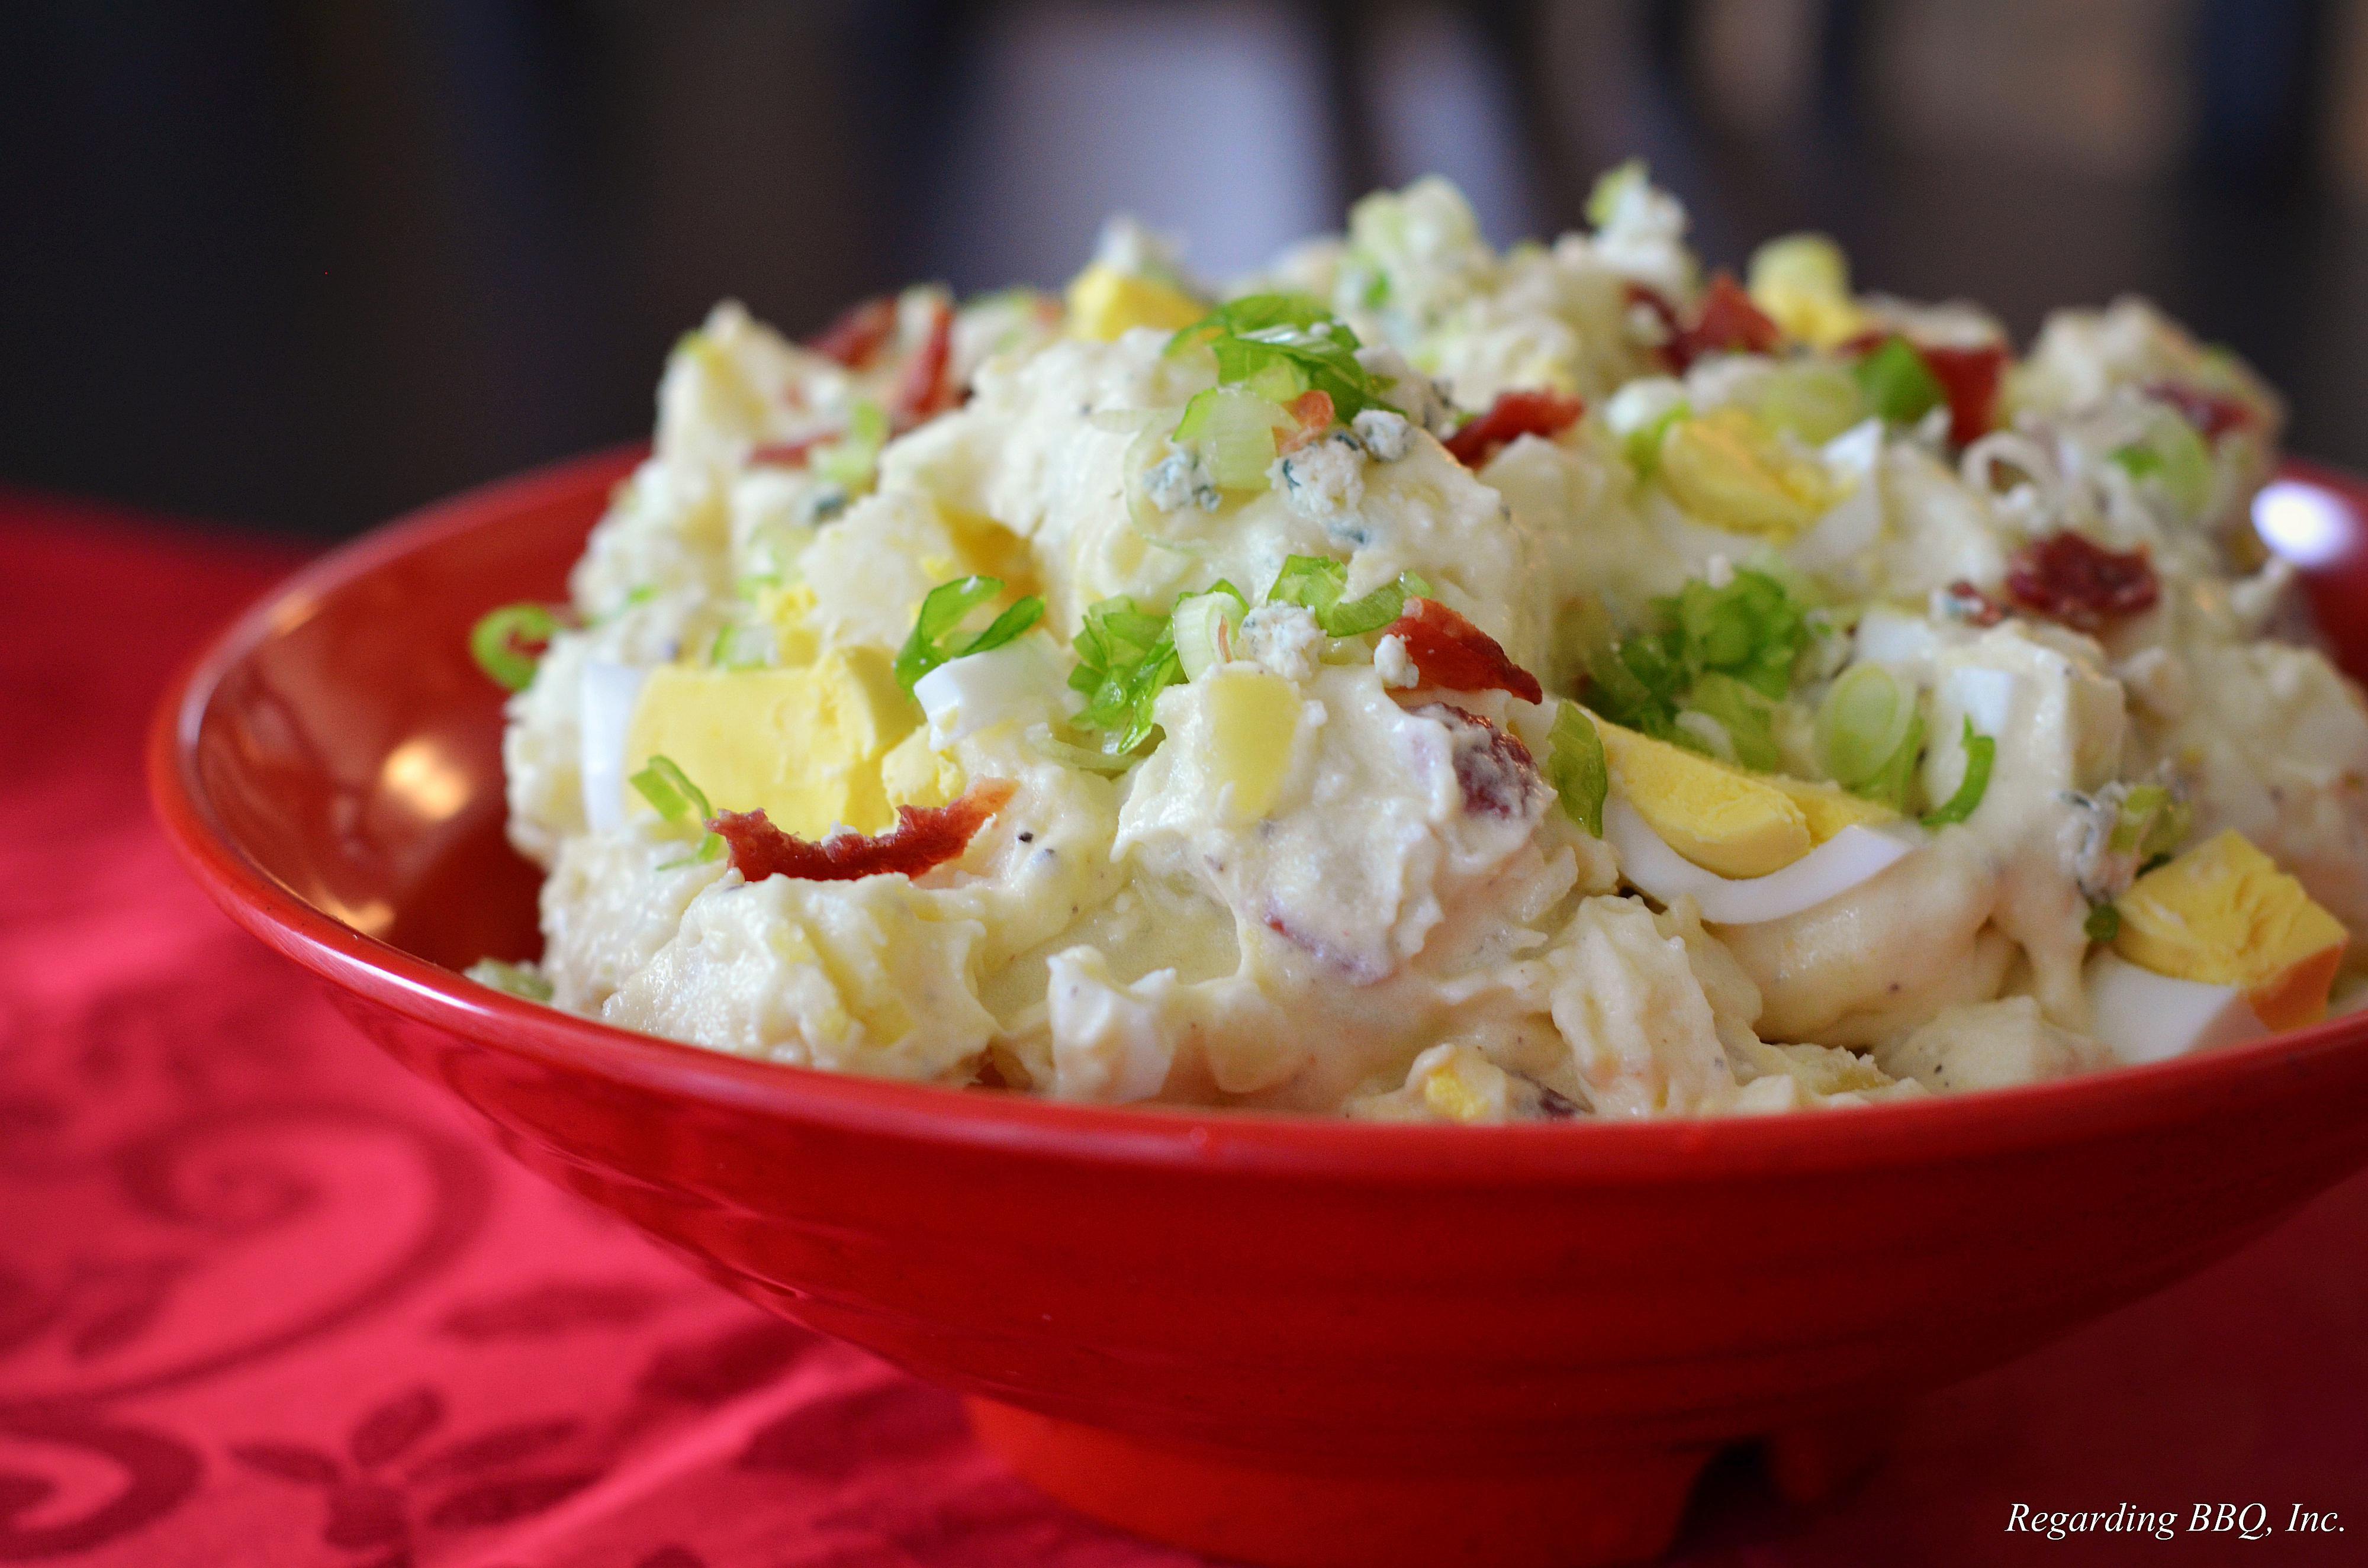 Bacon and Blue Cheese Potato Salad